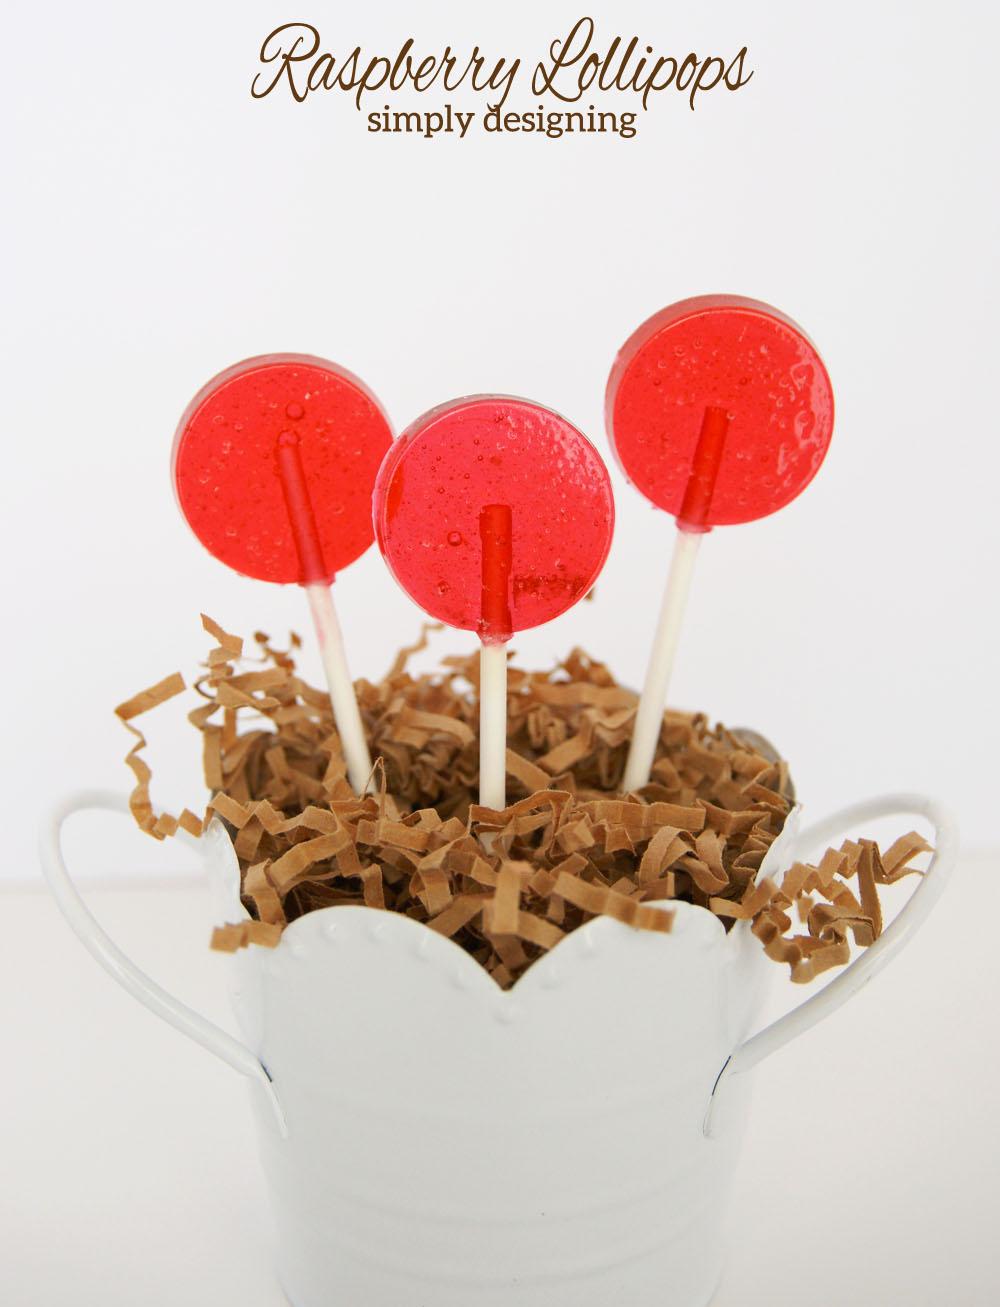 raspberry+lollipops Chocolate-Dipped Raspberry Lollipops 15